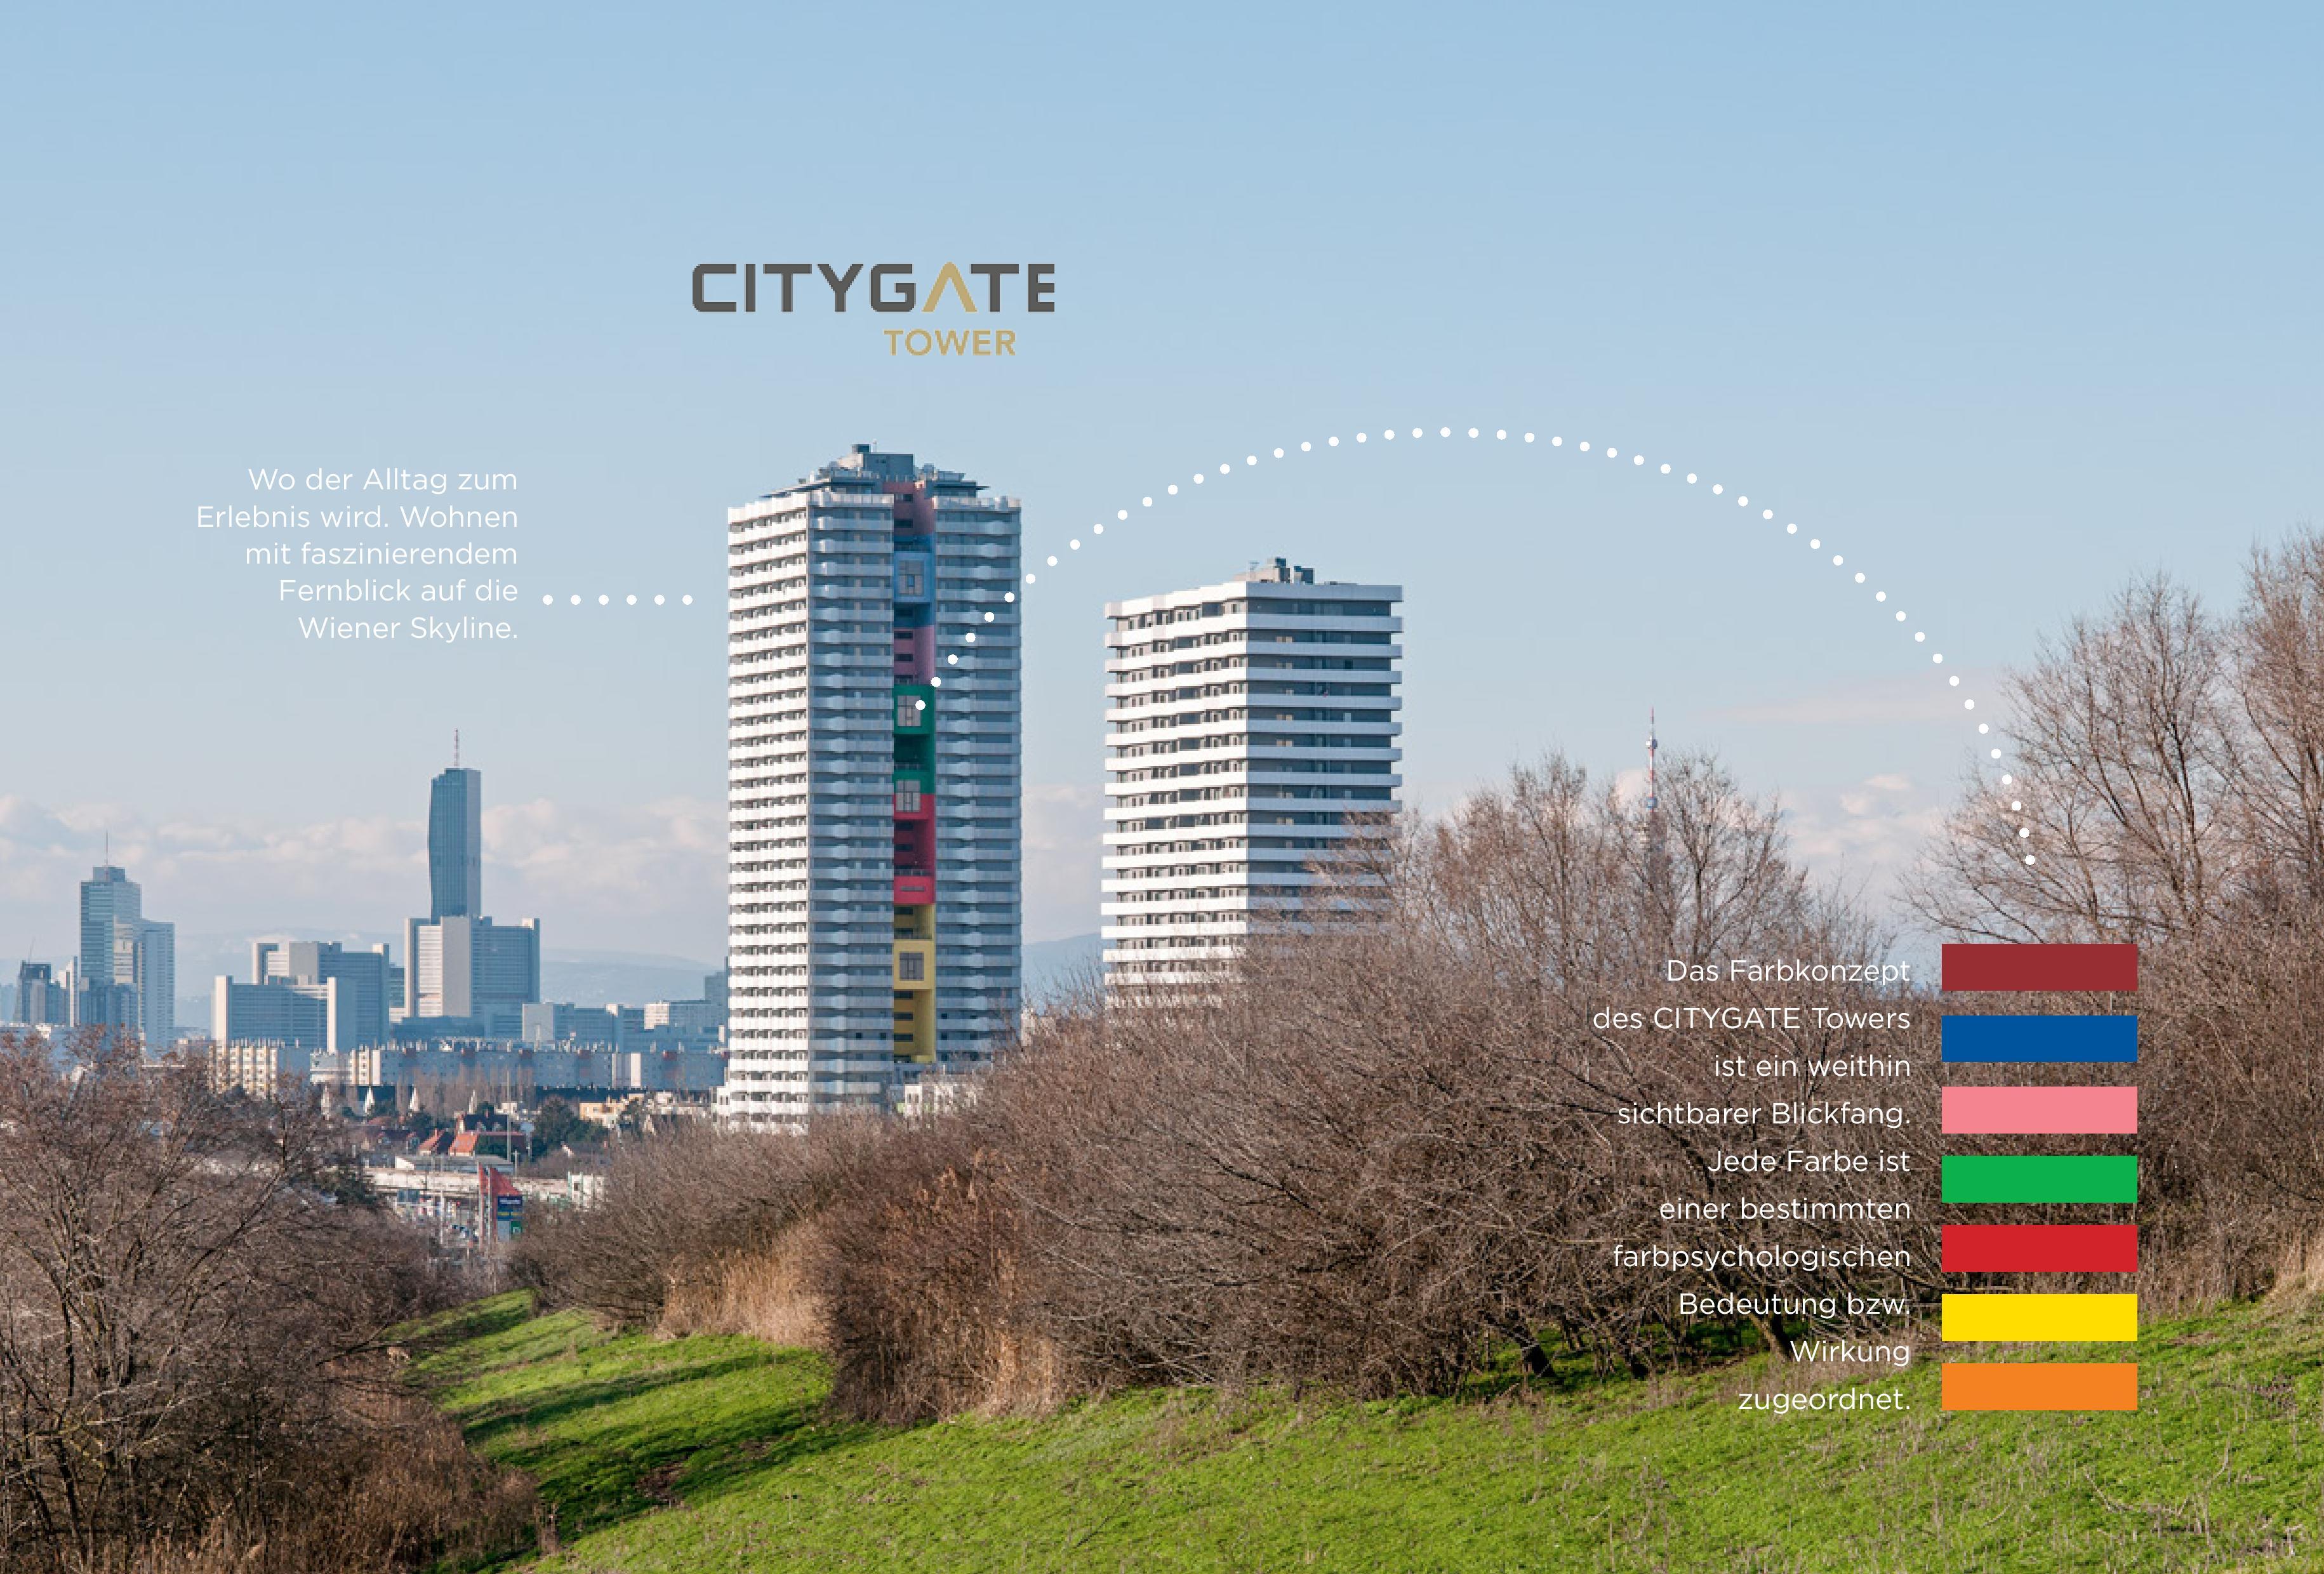 Citygate Tower